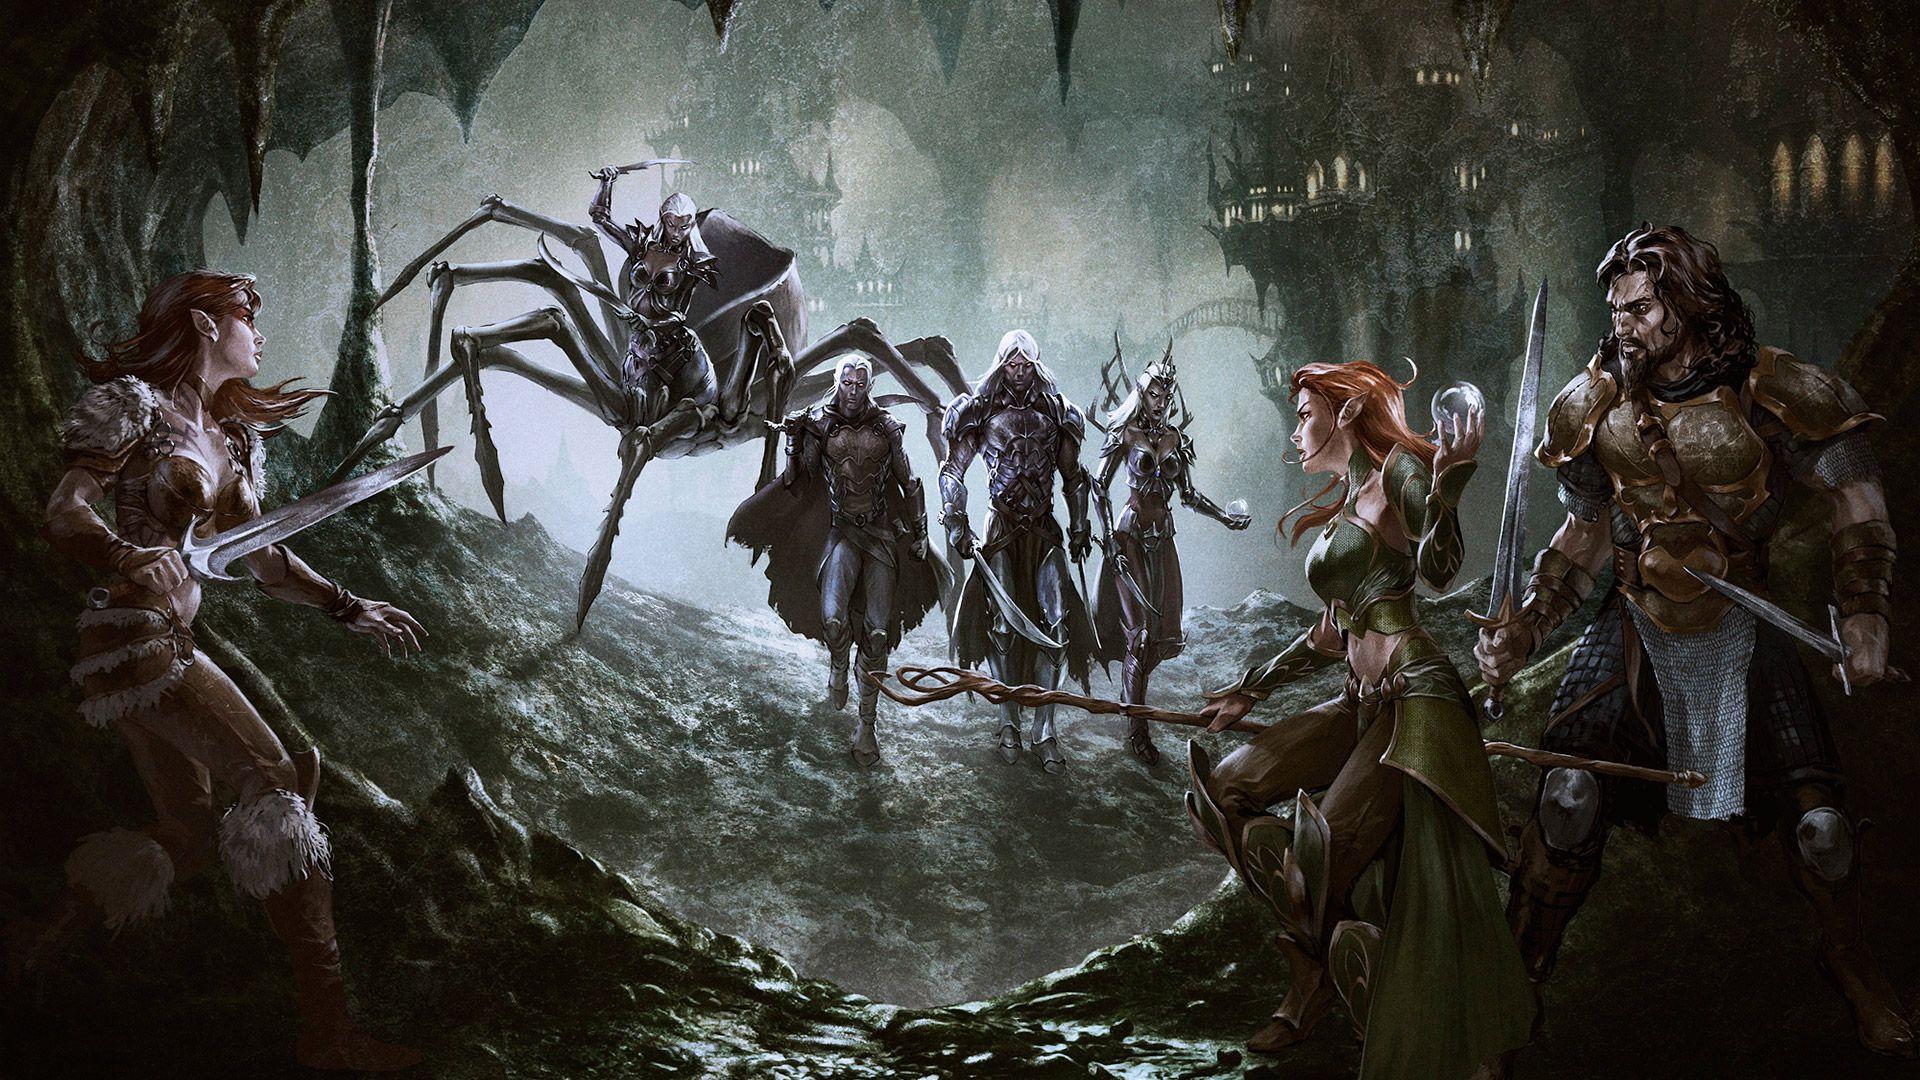 Pin By Patrick On Fantasy Art Scene Dungeons And Dragons Art Fantasy Art